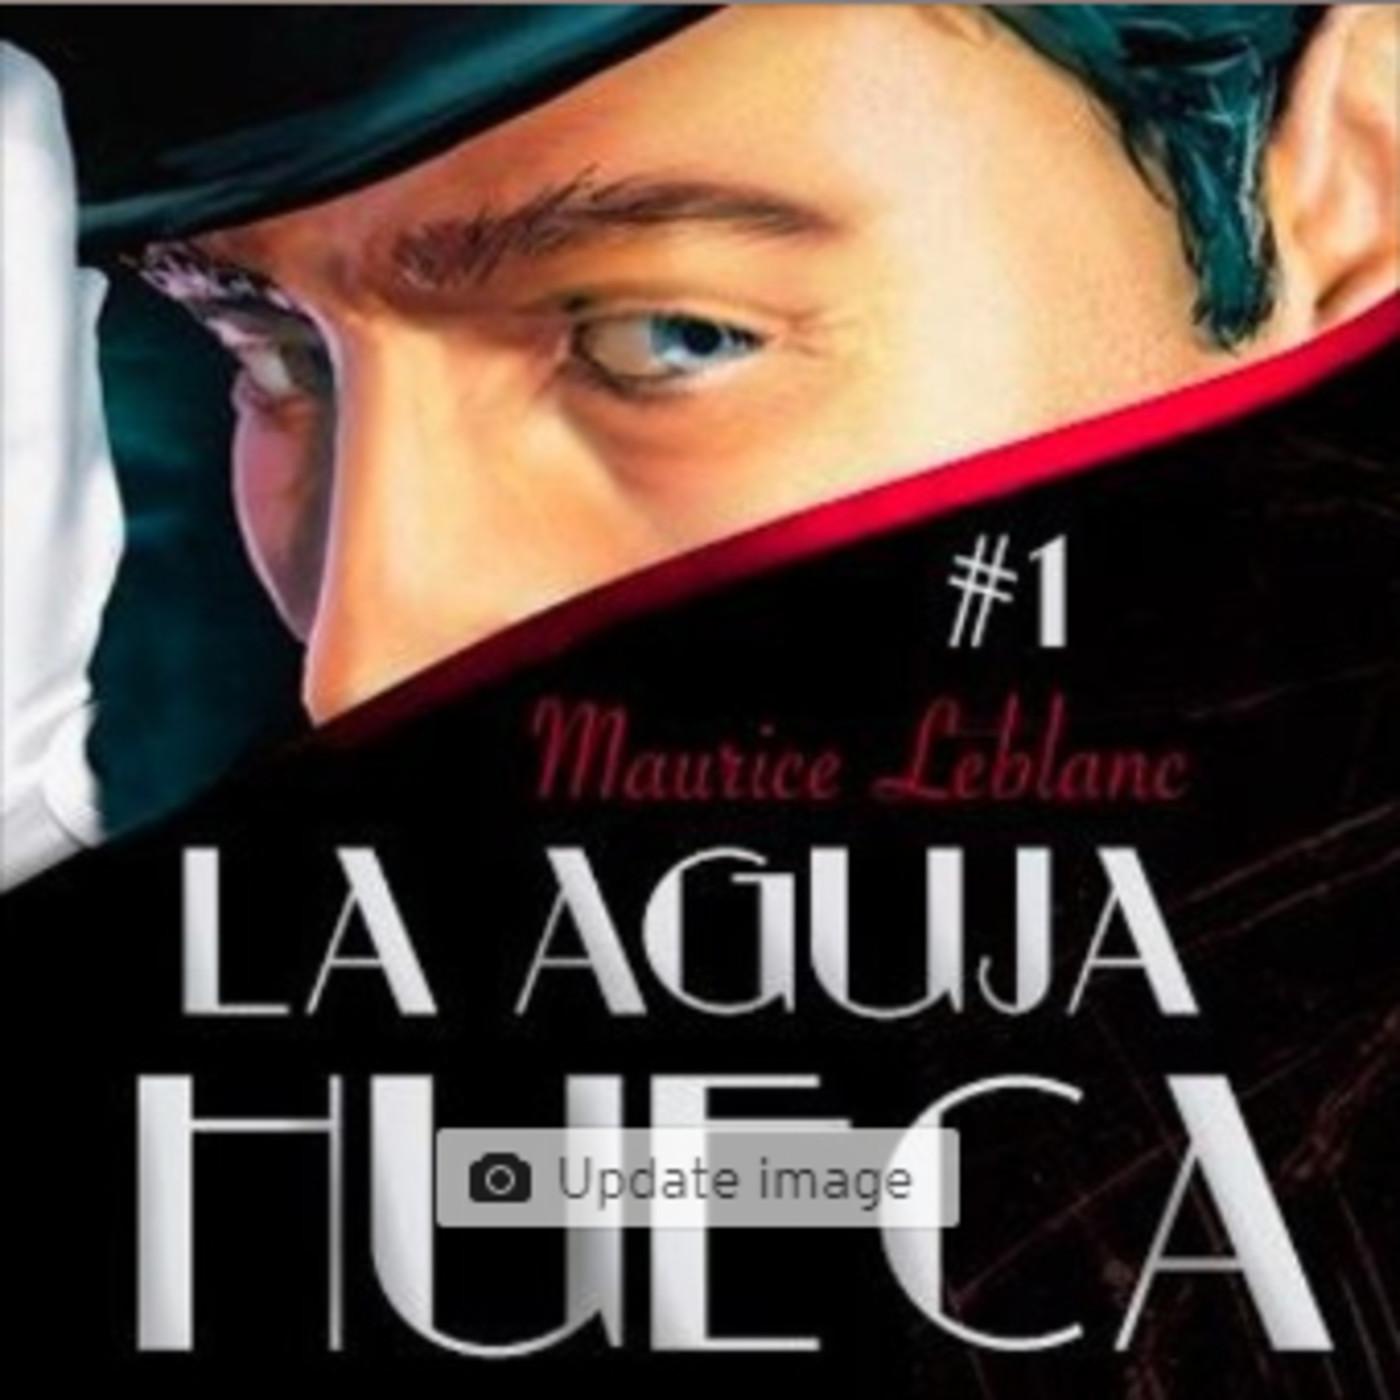 La Aguja Hueca de Maurice Leblanc